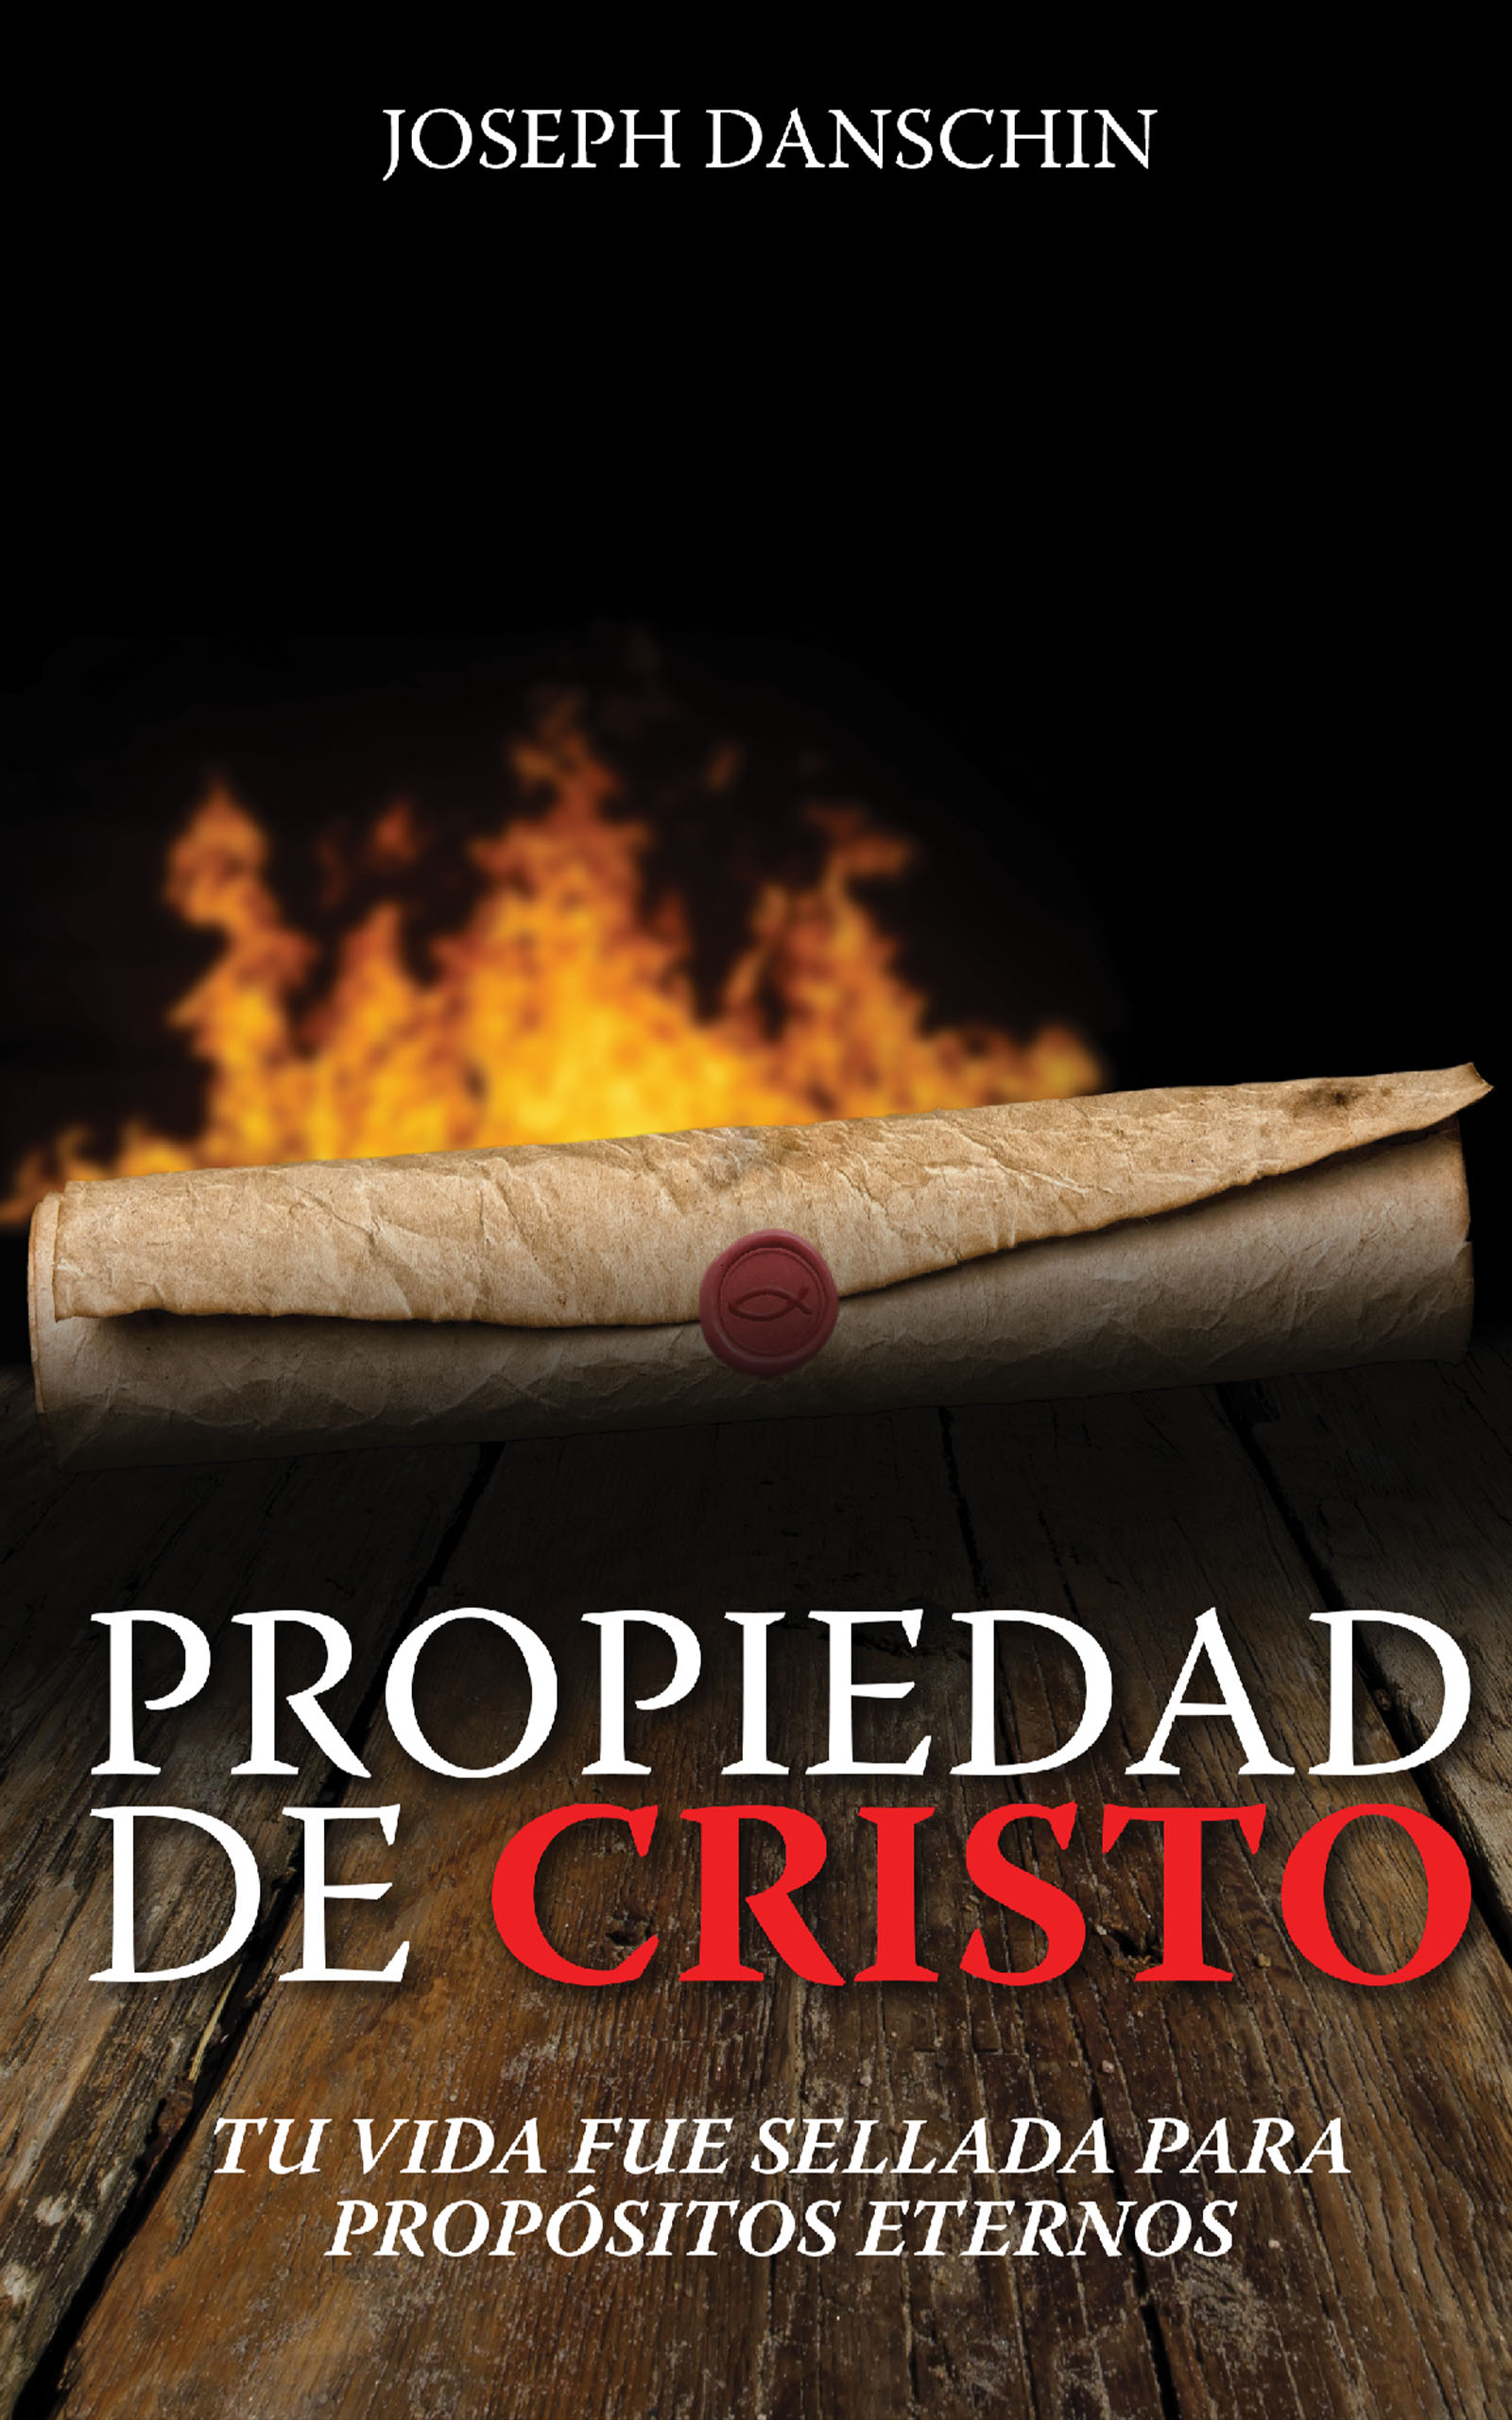 Propiedad de Cristo, de Joseph Danschin